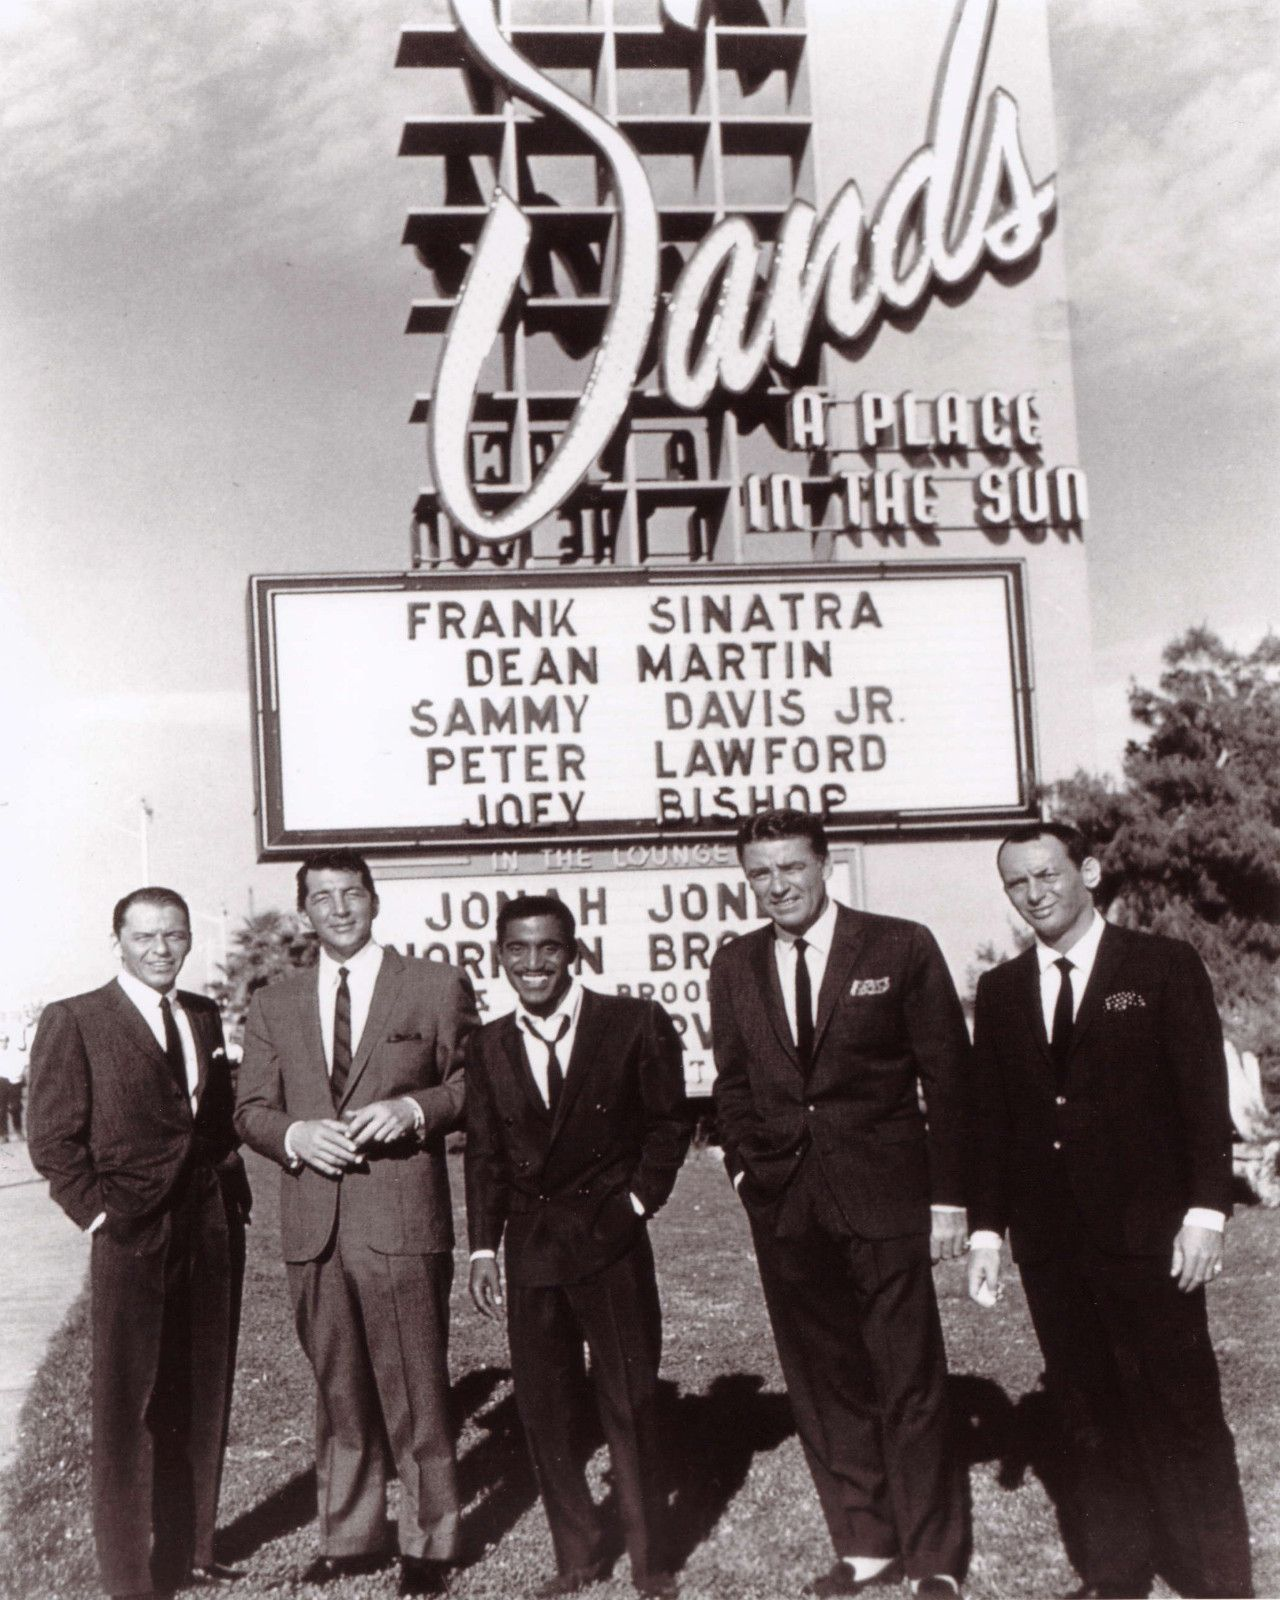 Frank sinatra sands hotel casino casino minnesota travel